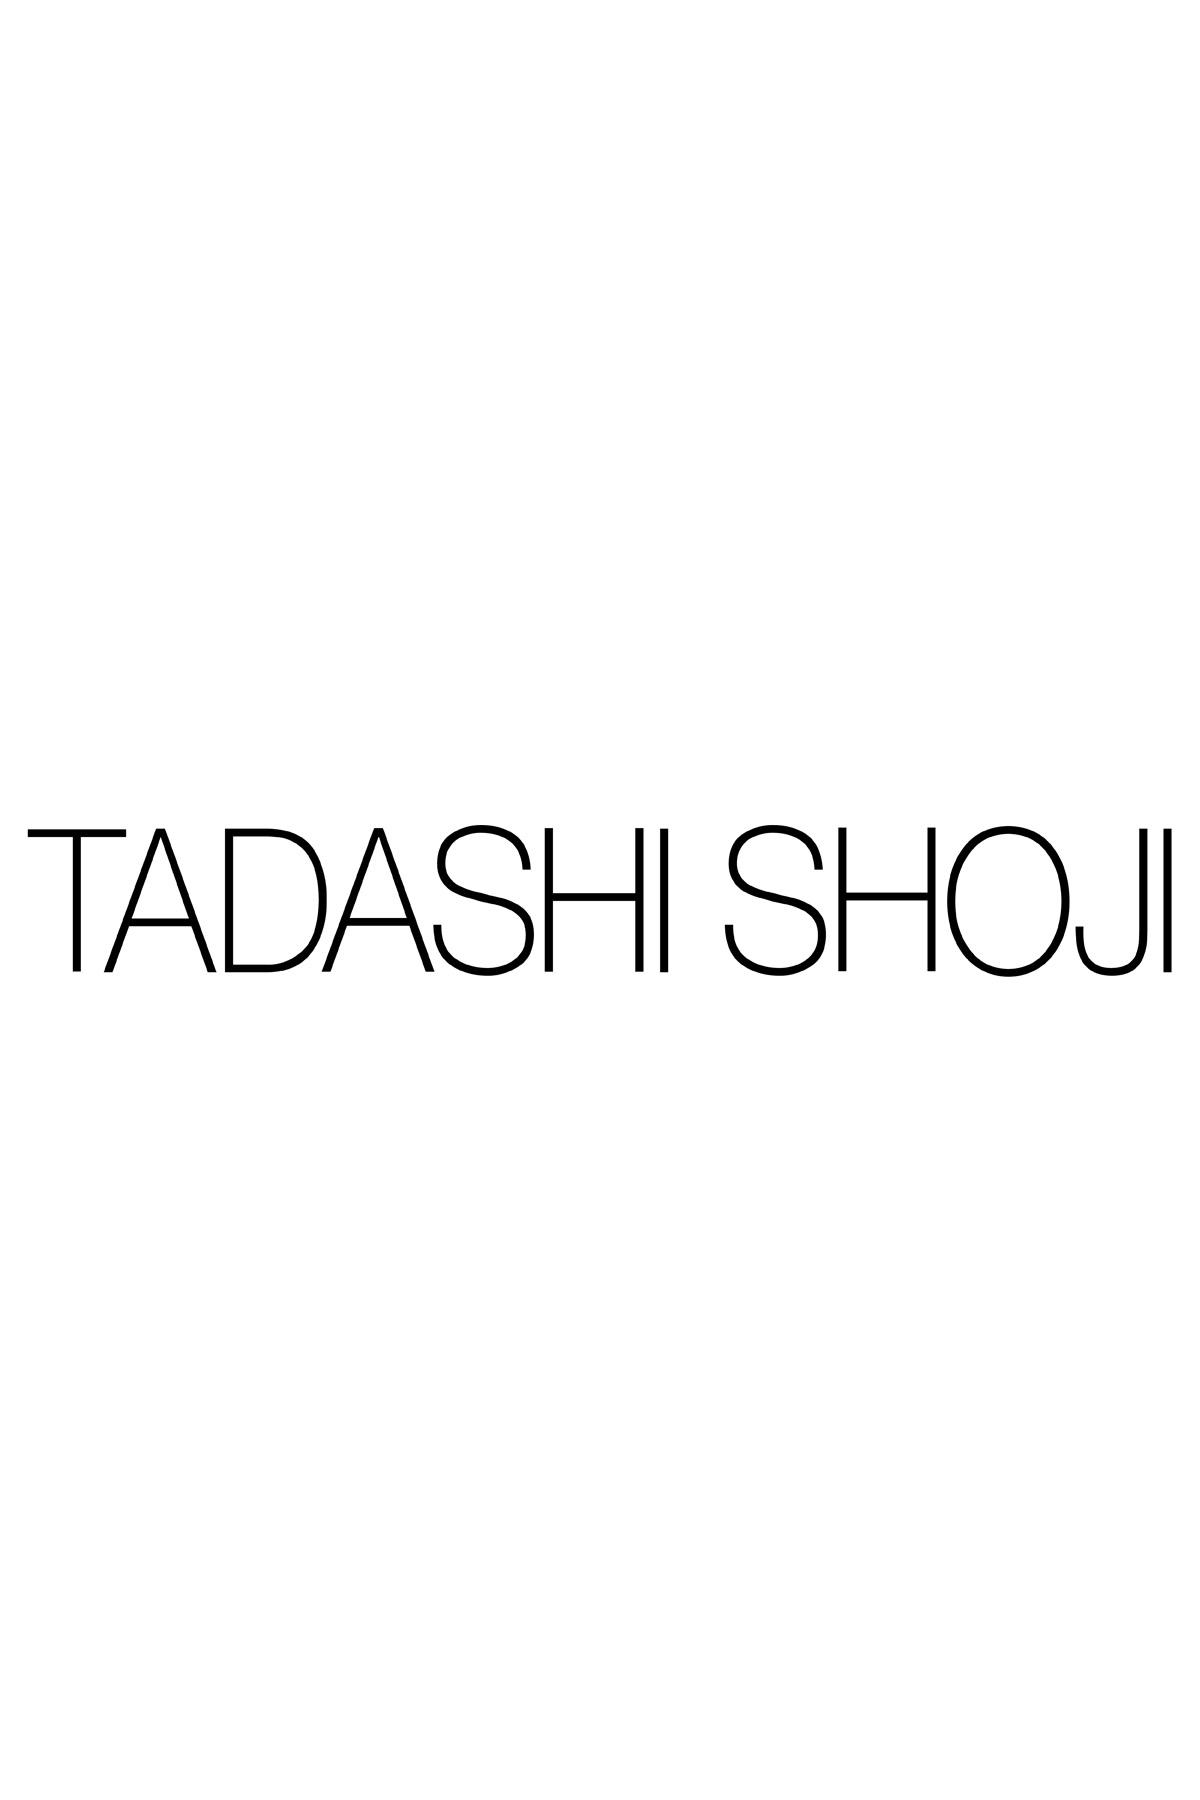 Tadashi Shoji Petite Size - Corded Embroidery on Tulle Dress with Sheer Illusion Neckline - Detail